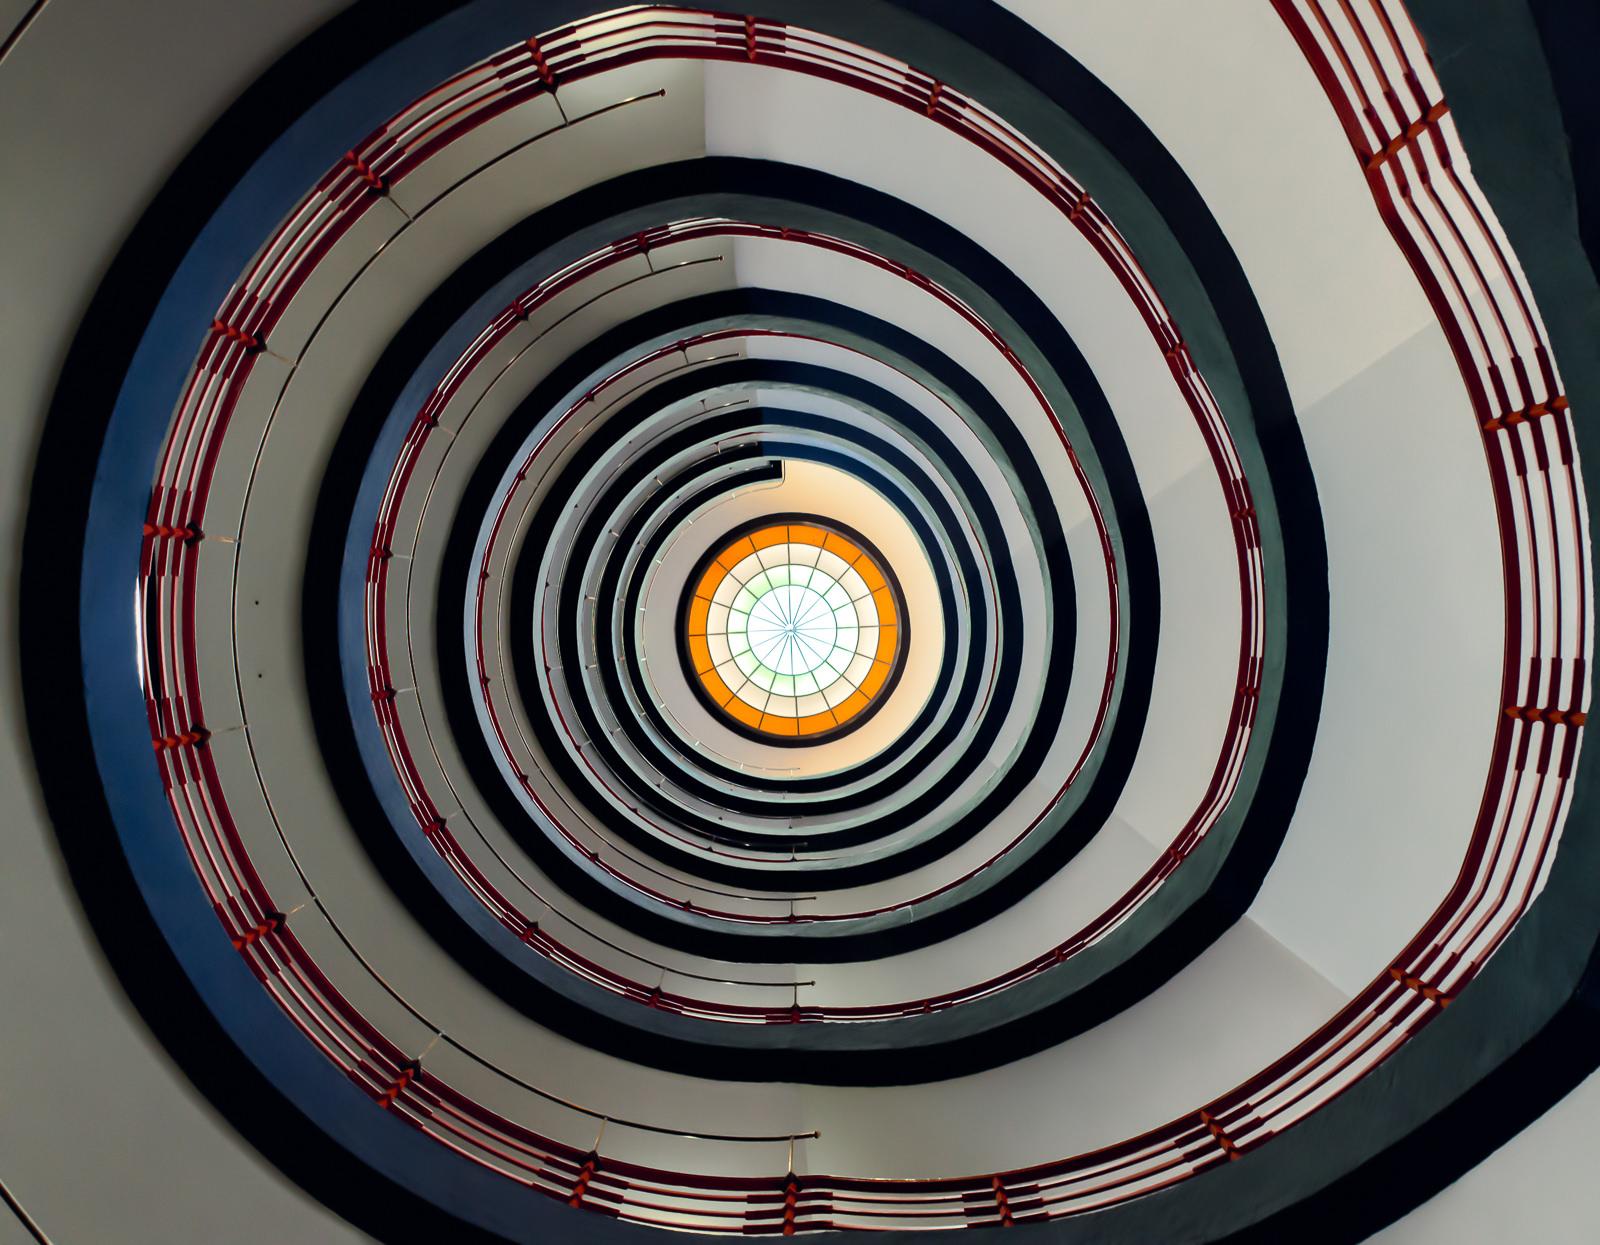 Spiral Staircase. Credit: Roman Pfeiffer